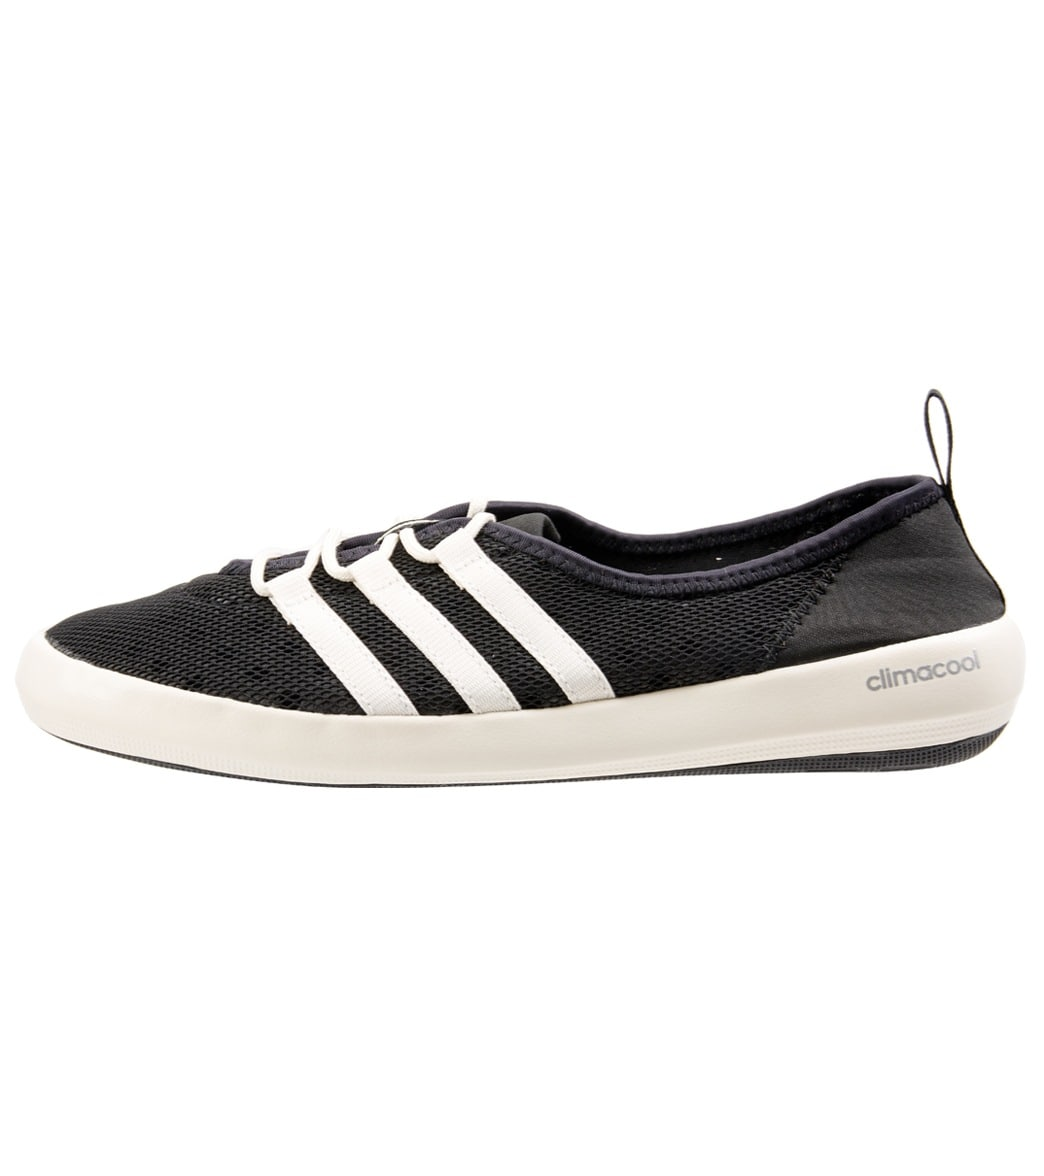 pretty nice 9e8c6 3b492 Adidas Womens Climacool Boat Sleek Water Shoes